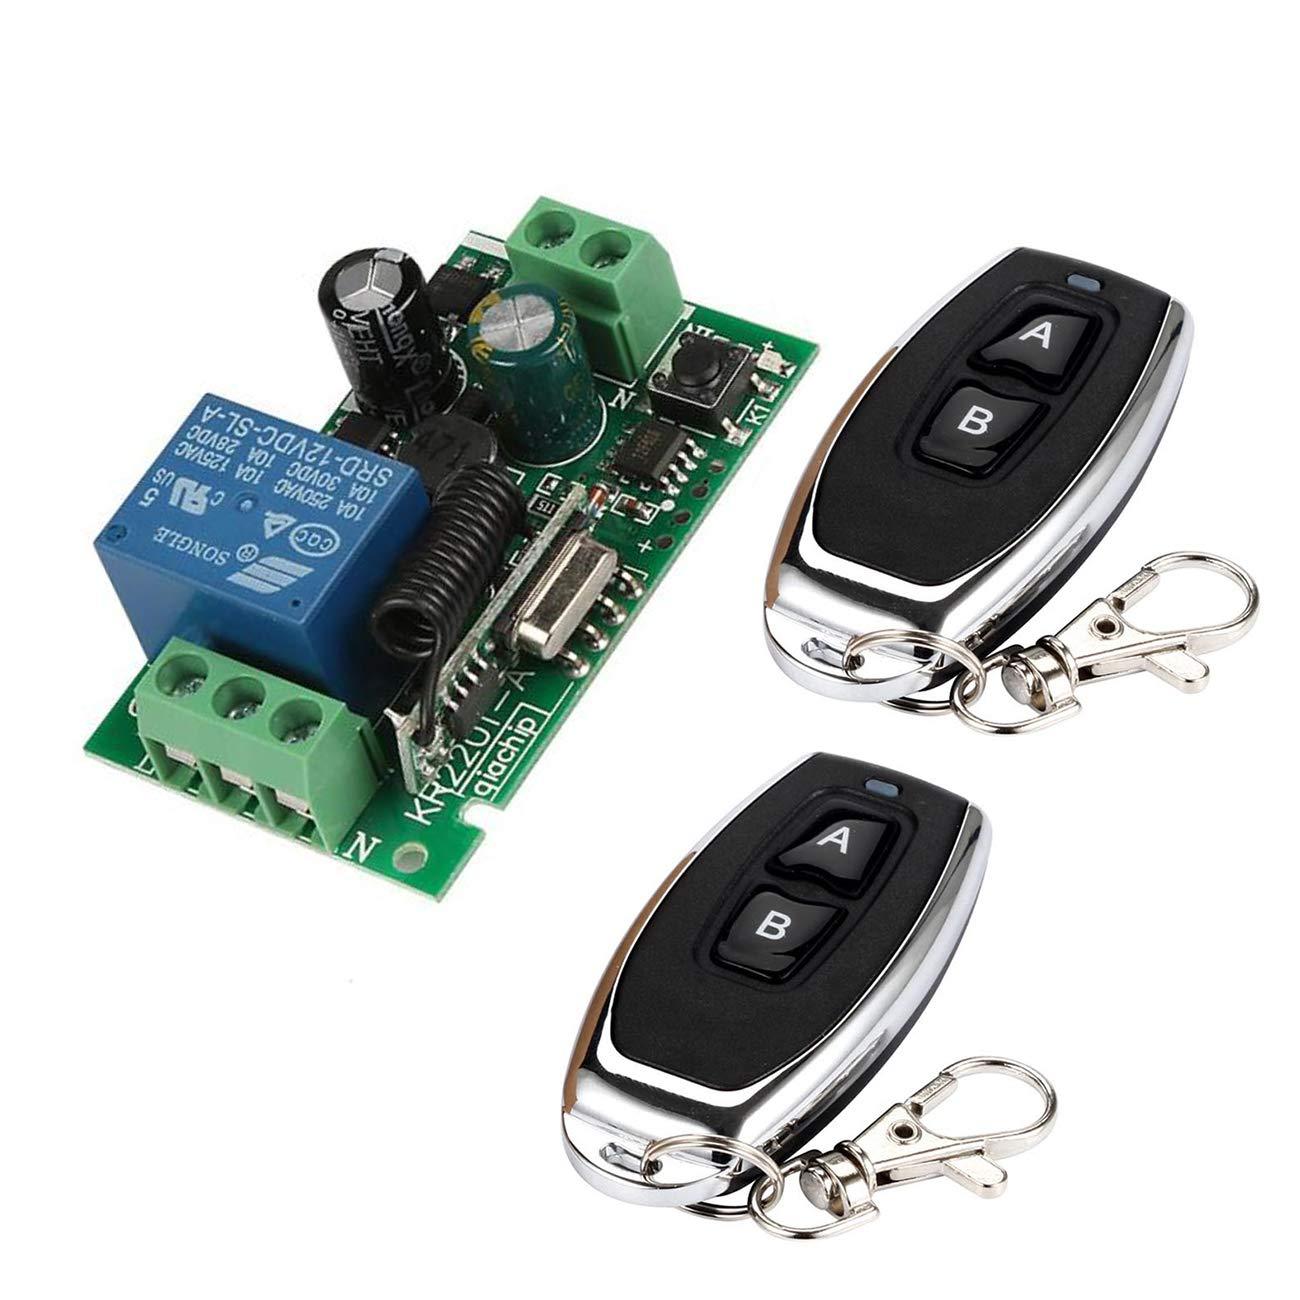 YLX Universal 433MHz AC 220V 1 Mó dulo de Receptor de Interruptor de Control Remoto Inalá mbrico + 2 RF 433MHz Transmisor Mando a Distancia